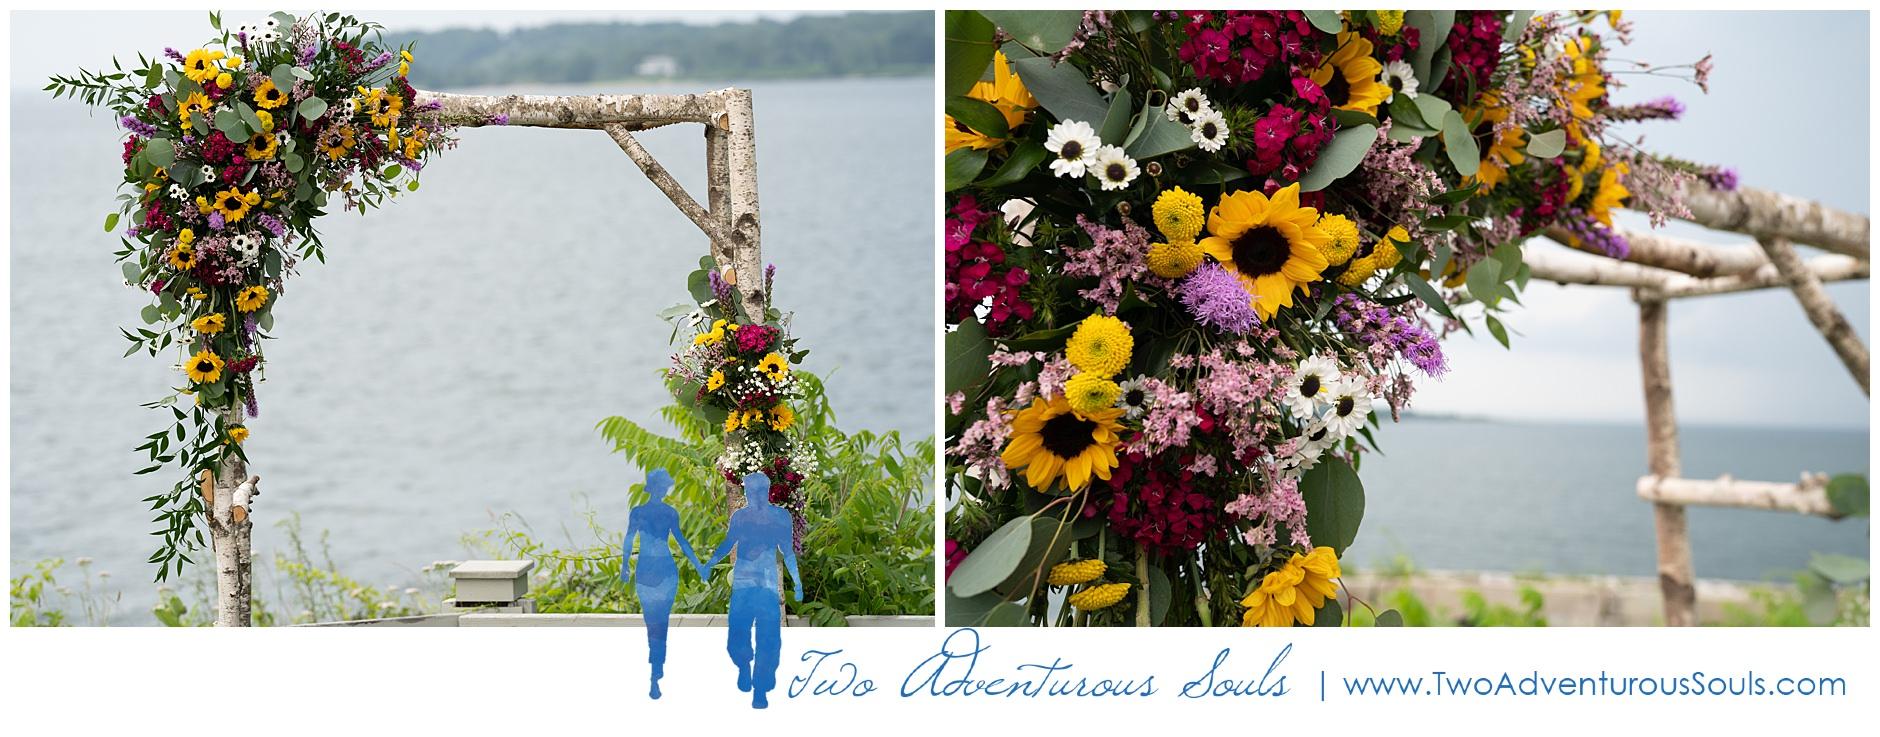 Maine Wedding Photographers, SMCC Wedding Photographers, Southern Maine Community College Wedding Photographers, Two Adventurous Souls-AshleyAaron_0021.jpg